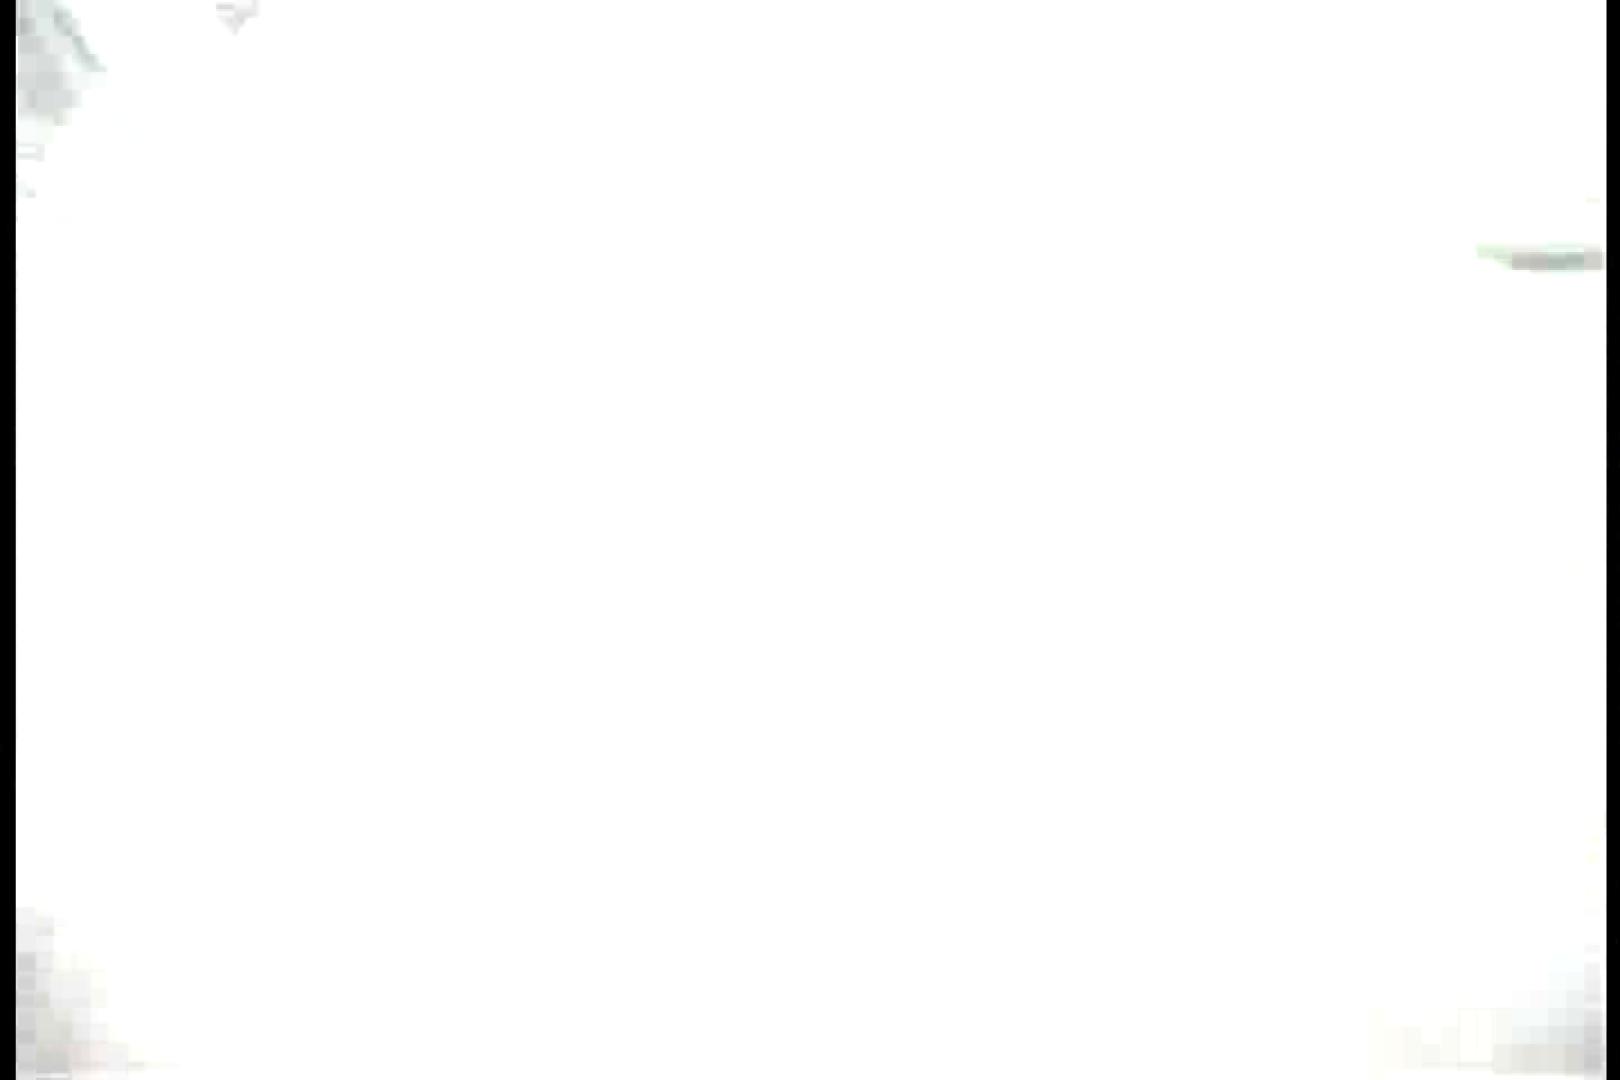 RQカメラ地獄Vol.3 美女OL   レースクイーン  83連発 49